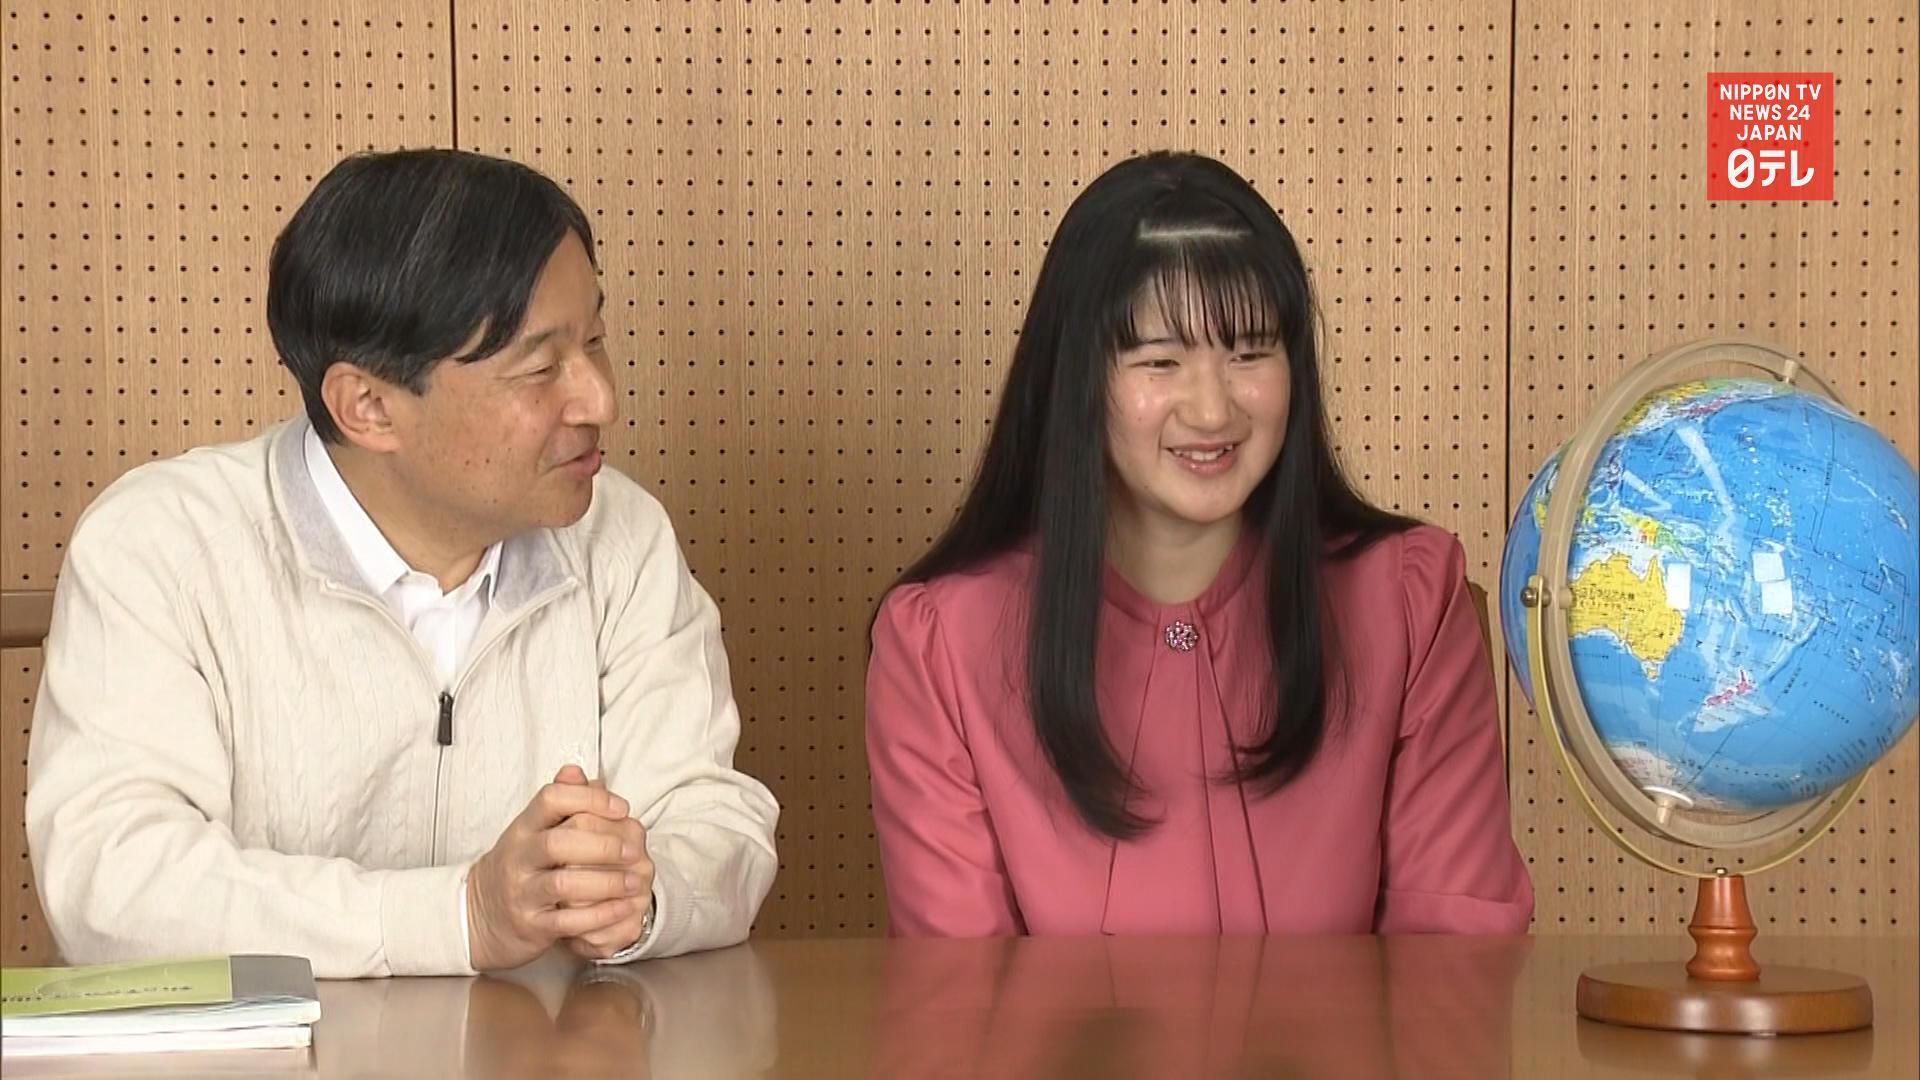 Princess Aiko turns 18